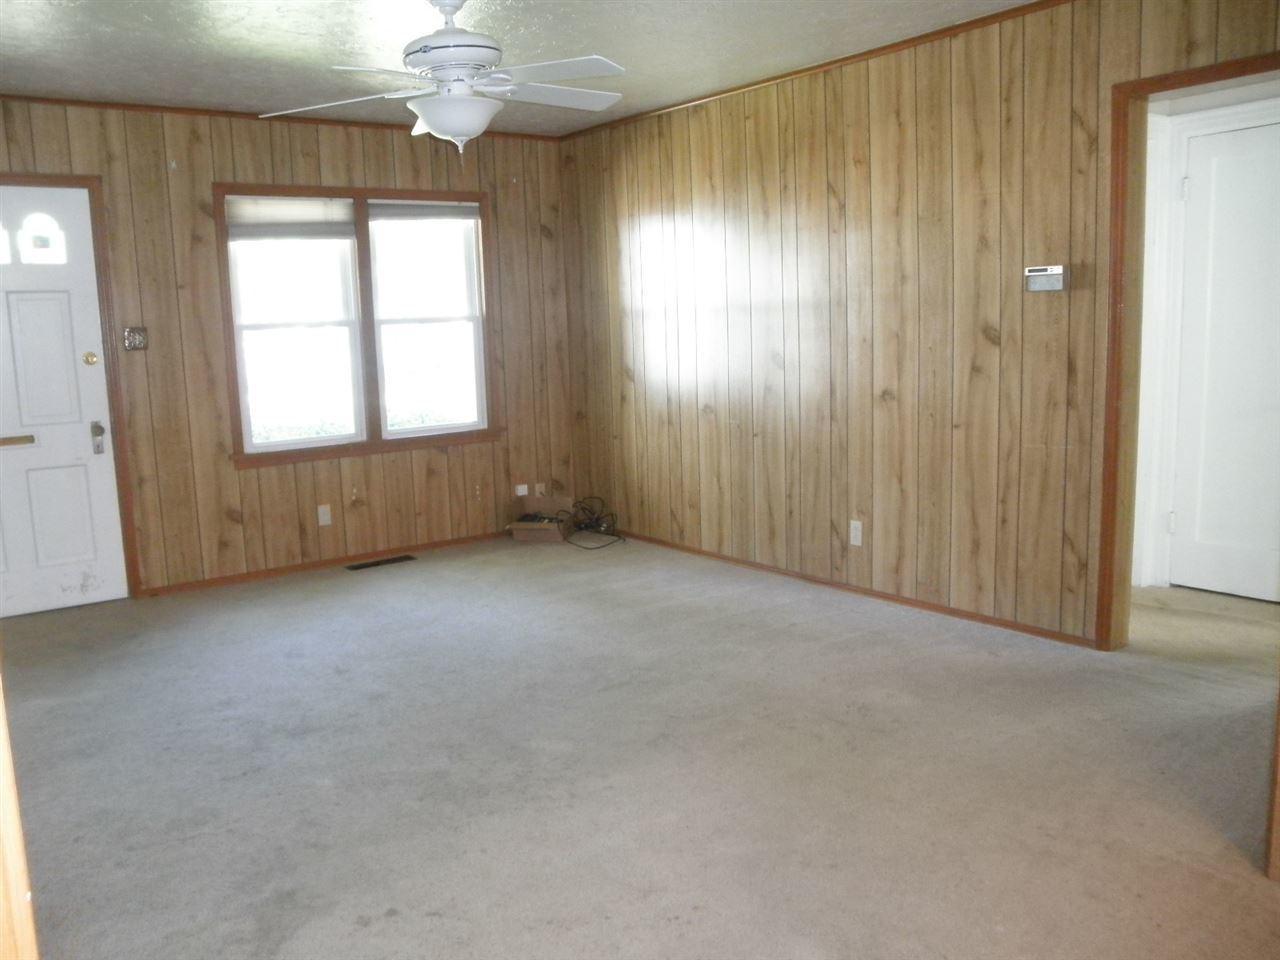 Sold Intraoffice W/MLS   516 N 11th  Ponca City, OK 74601 7